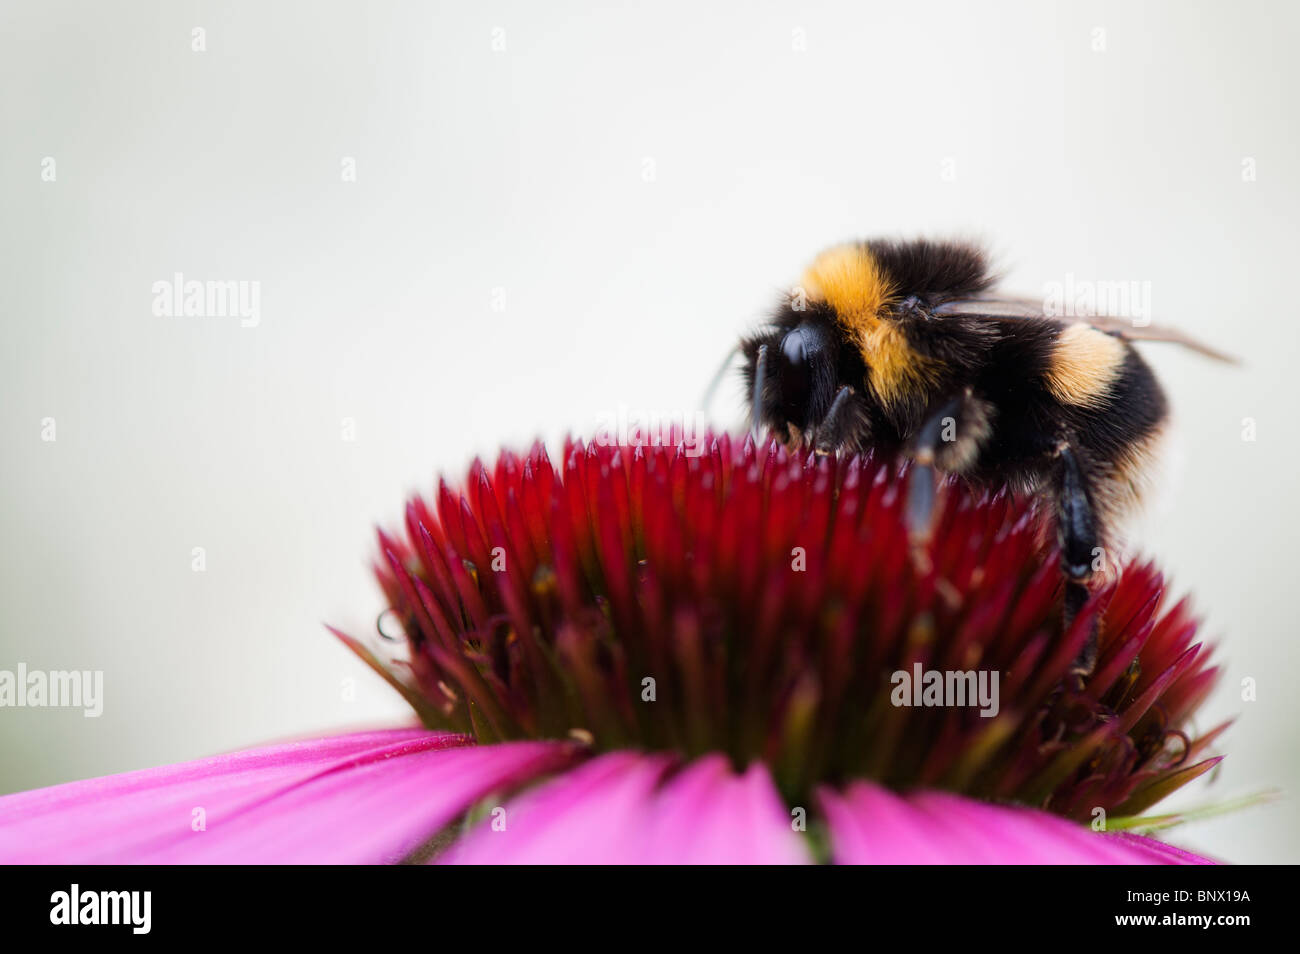 Bumble bee, bombus lucorum, feeding on an echinacea purpurea flower against a white background - Stock Image